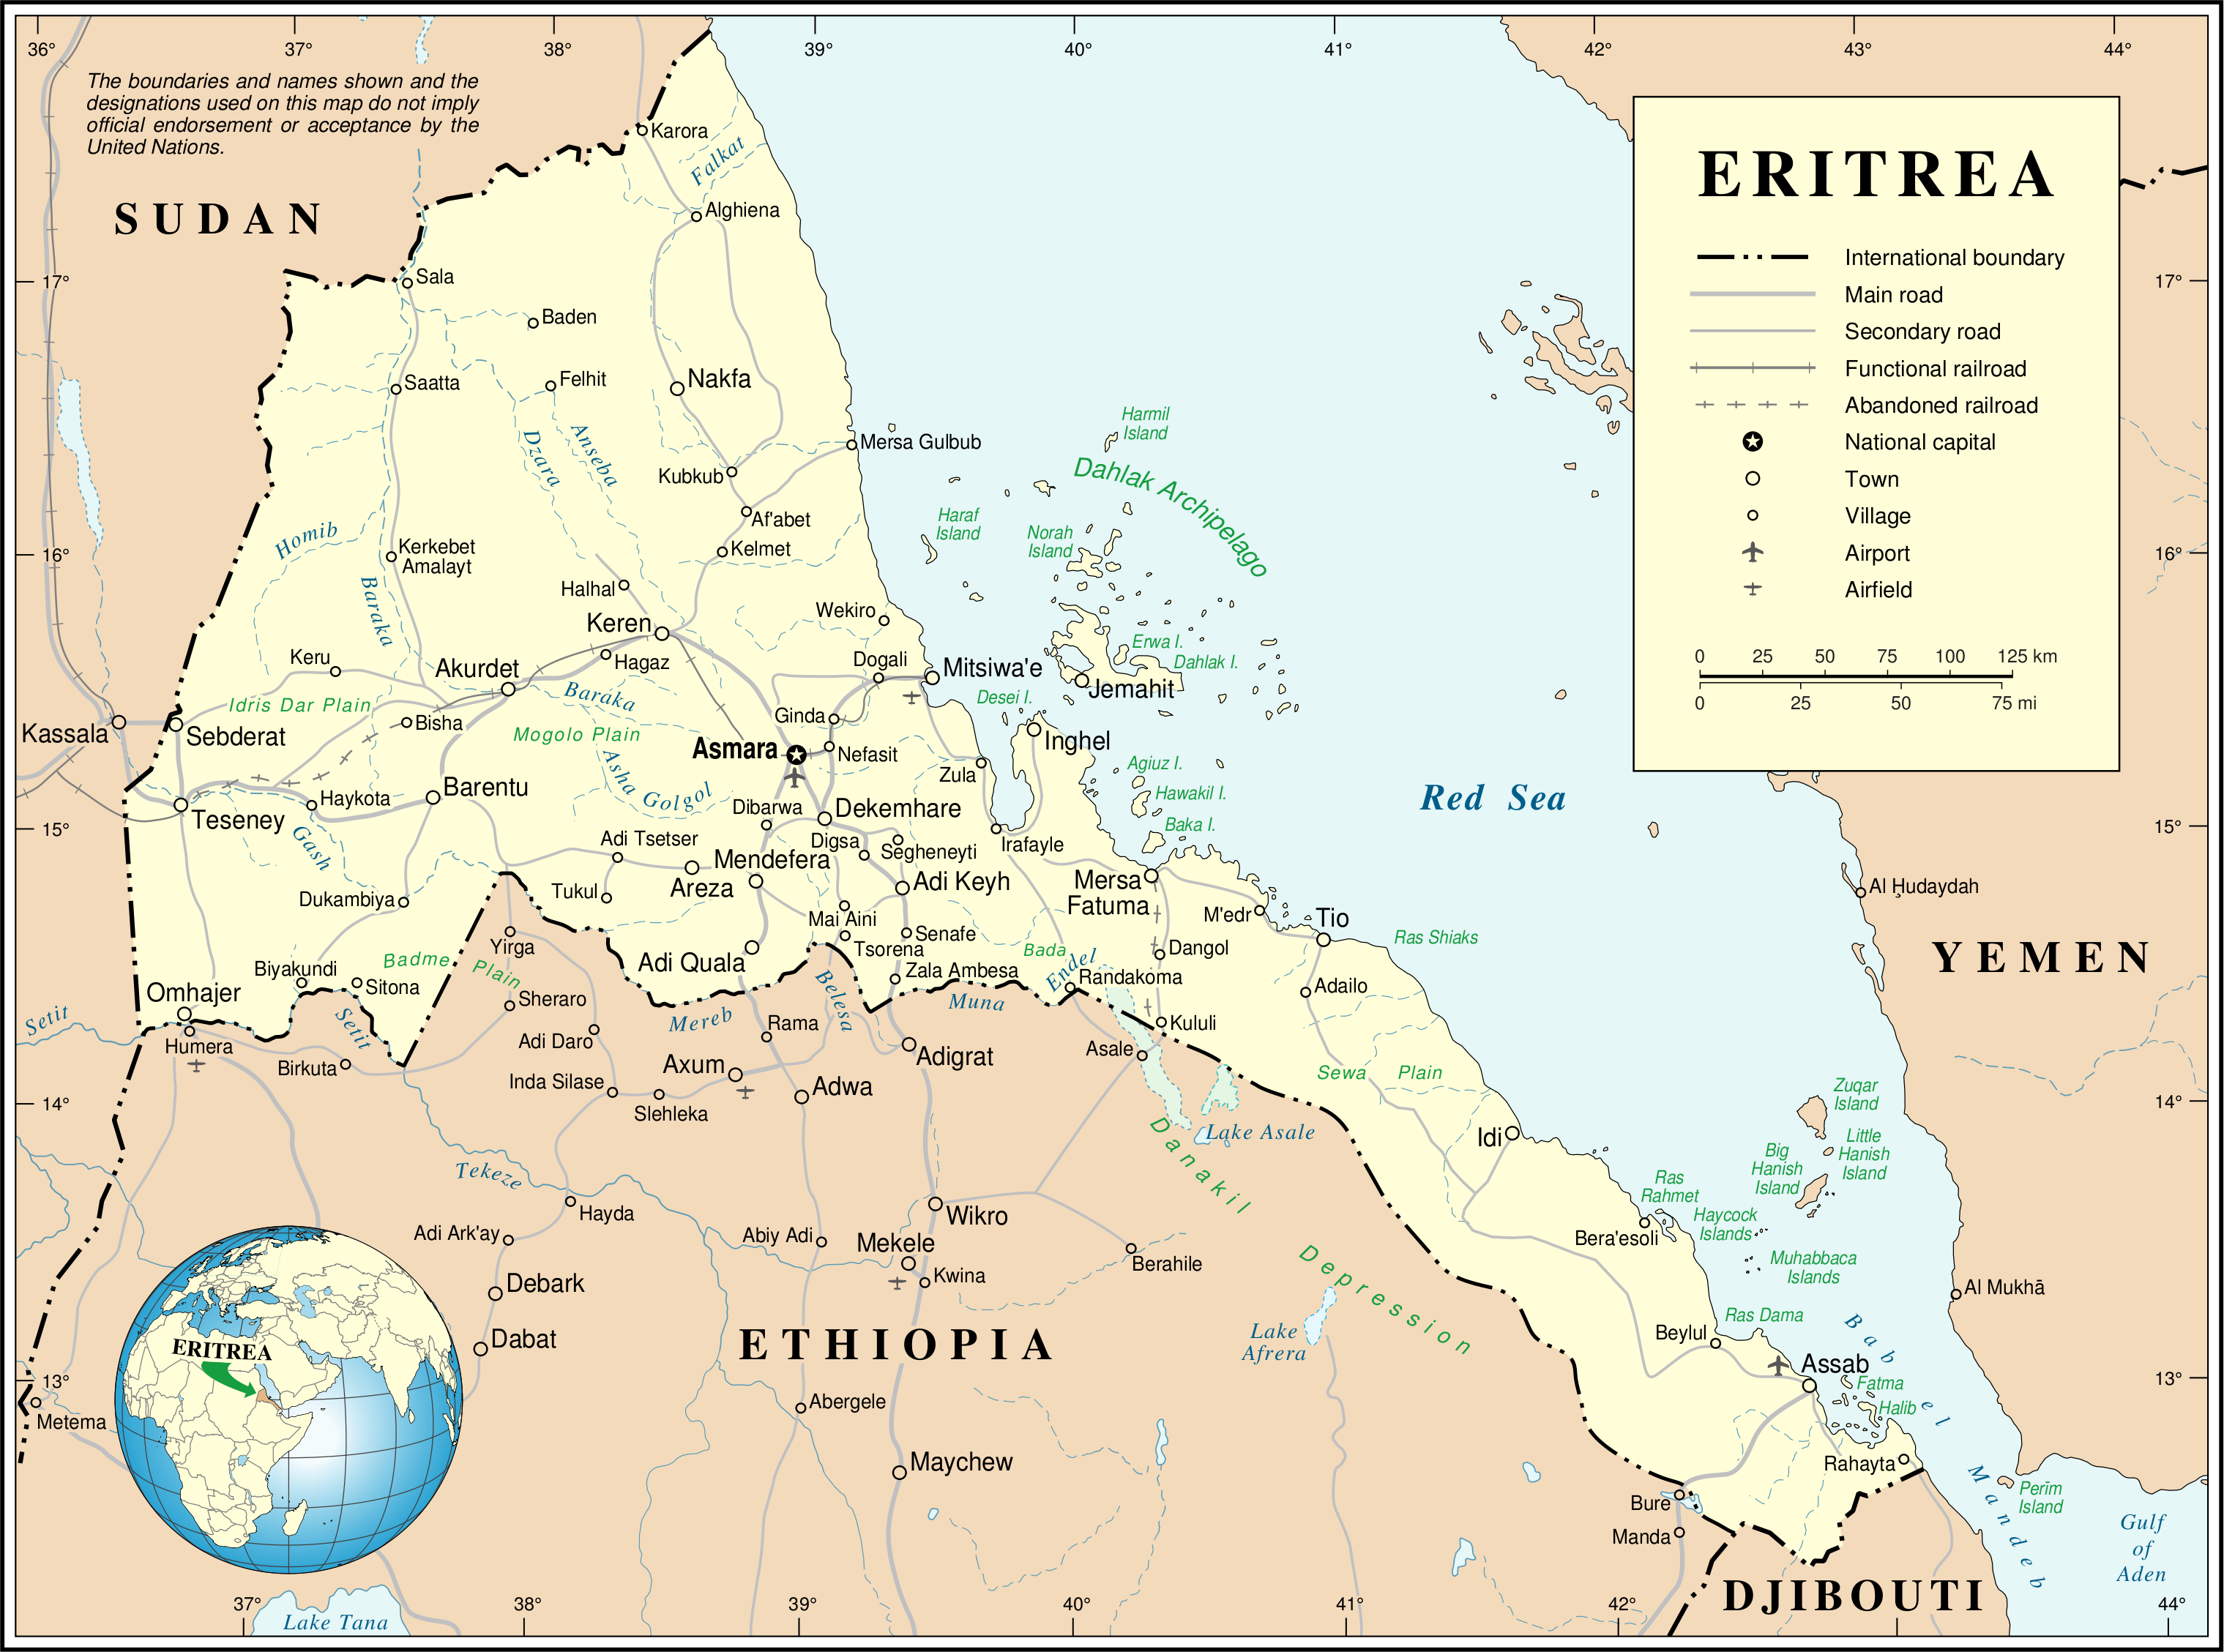 http://upload.wikimedia.org/wikipedia/commons/b/b2/Un-eritrea.png